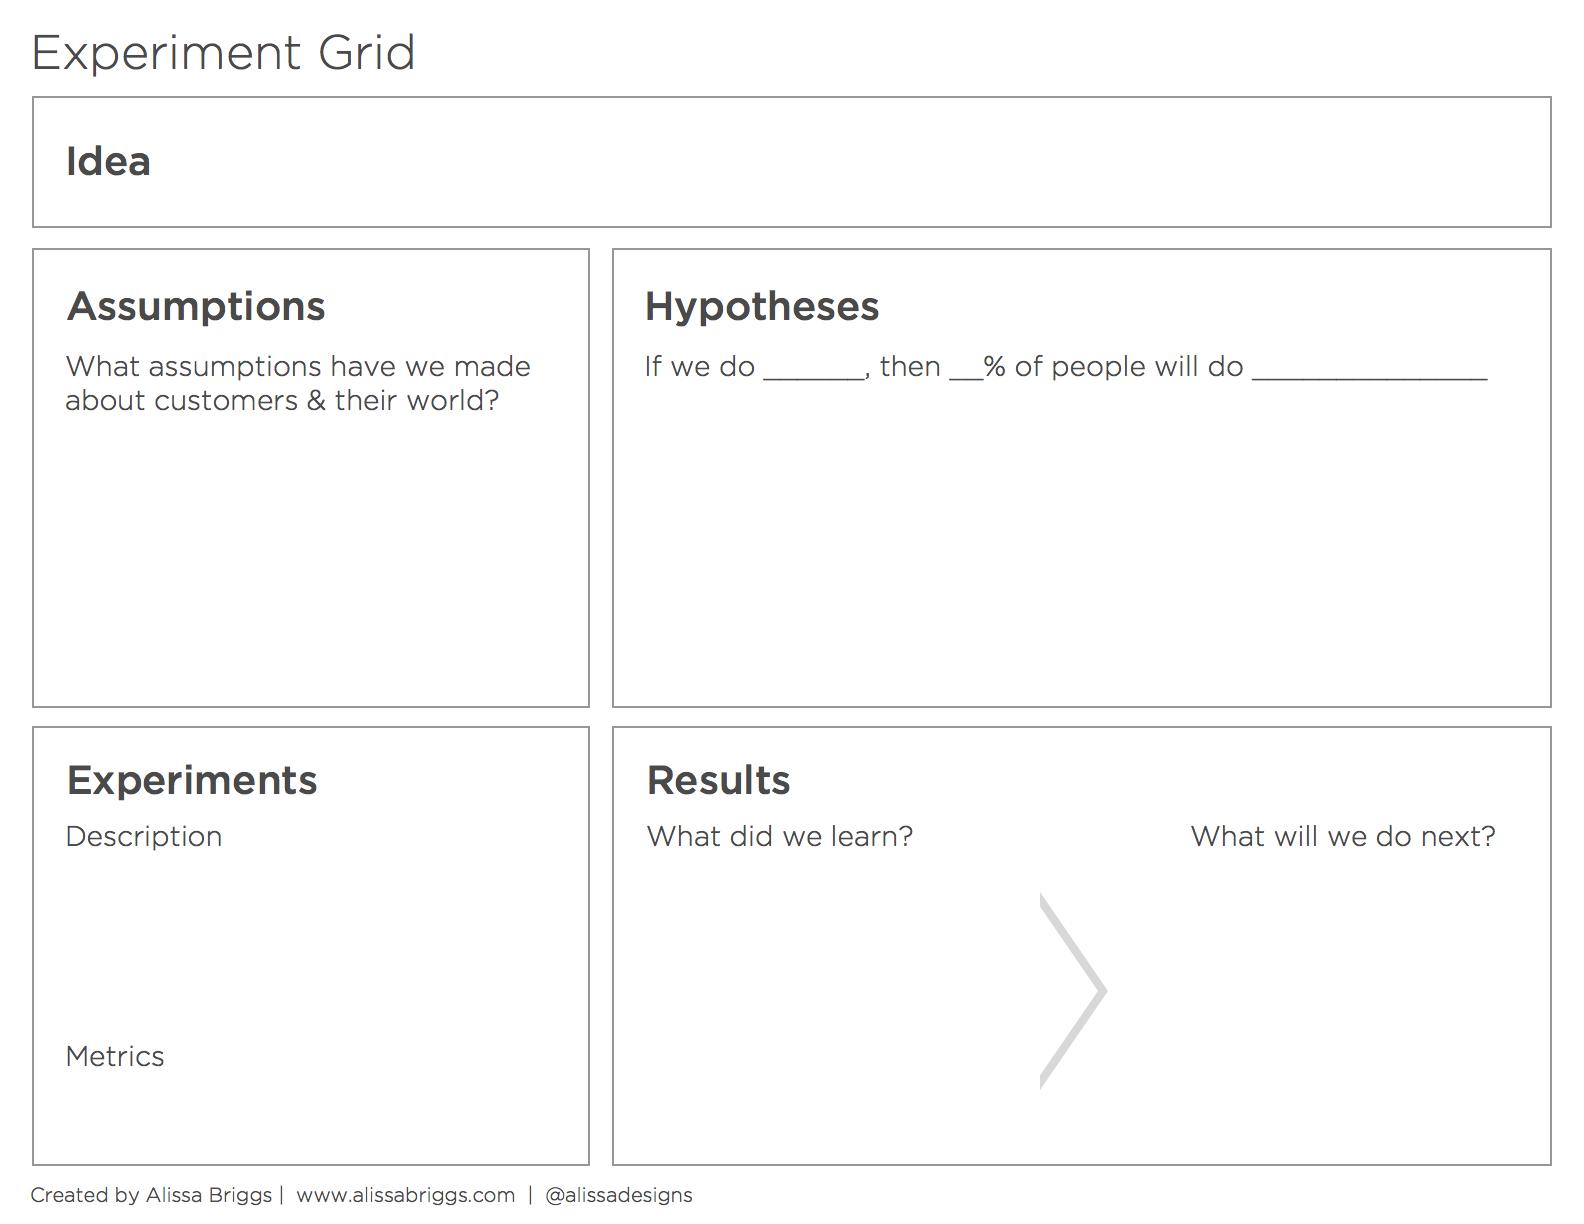 ksd. blog | Alissa Briggs Experiment Grid